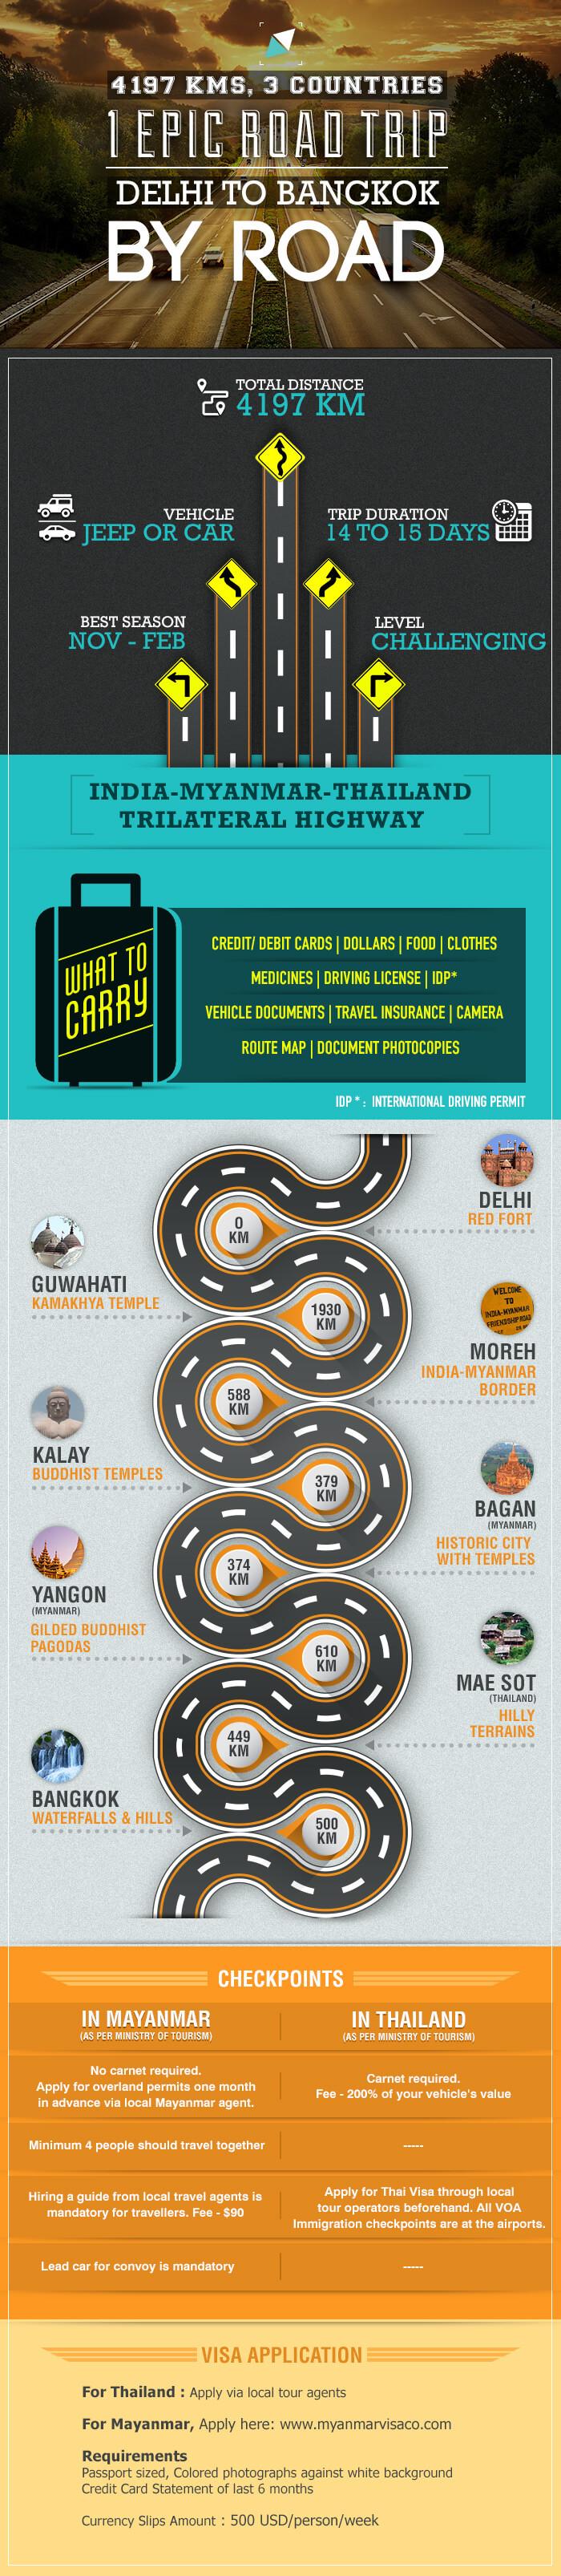 The Epic Road Trip - New Delhi to Bangkok - infographic